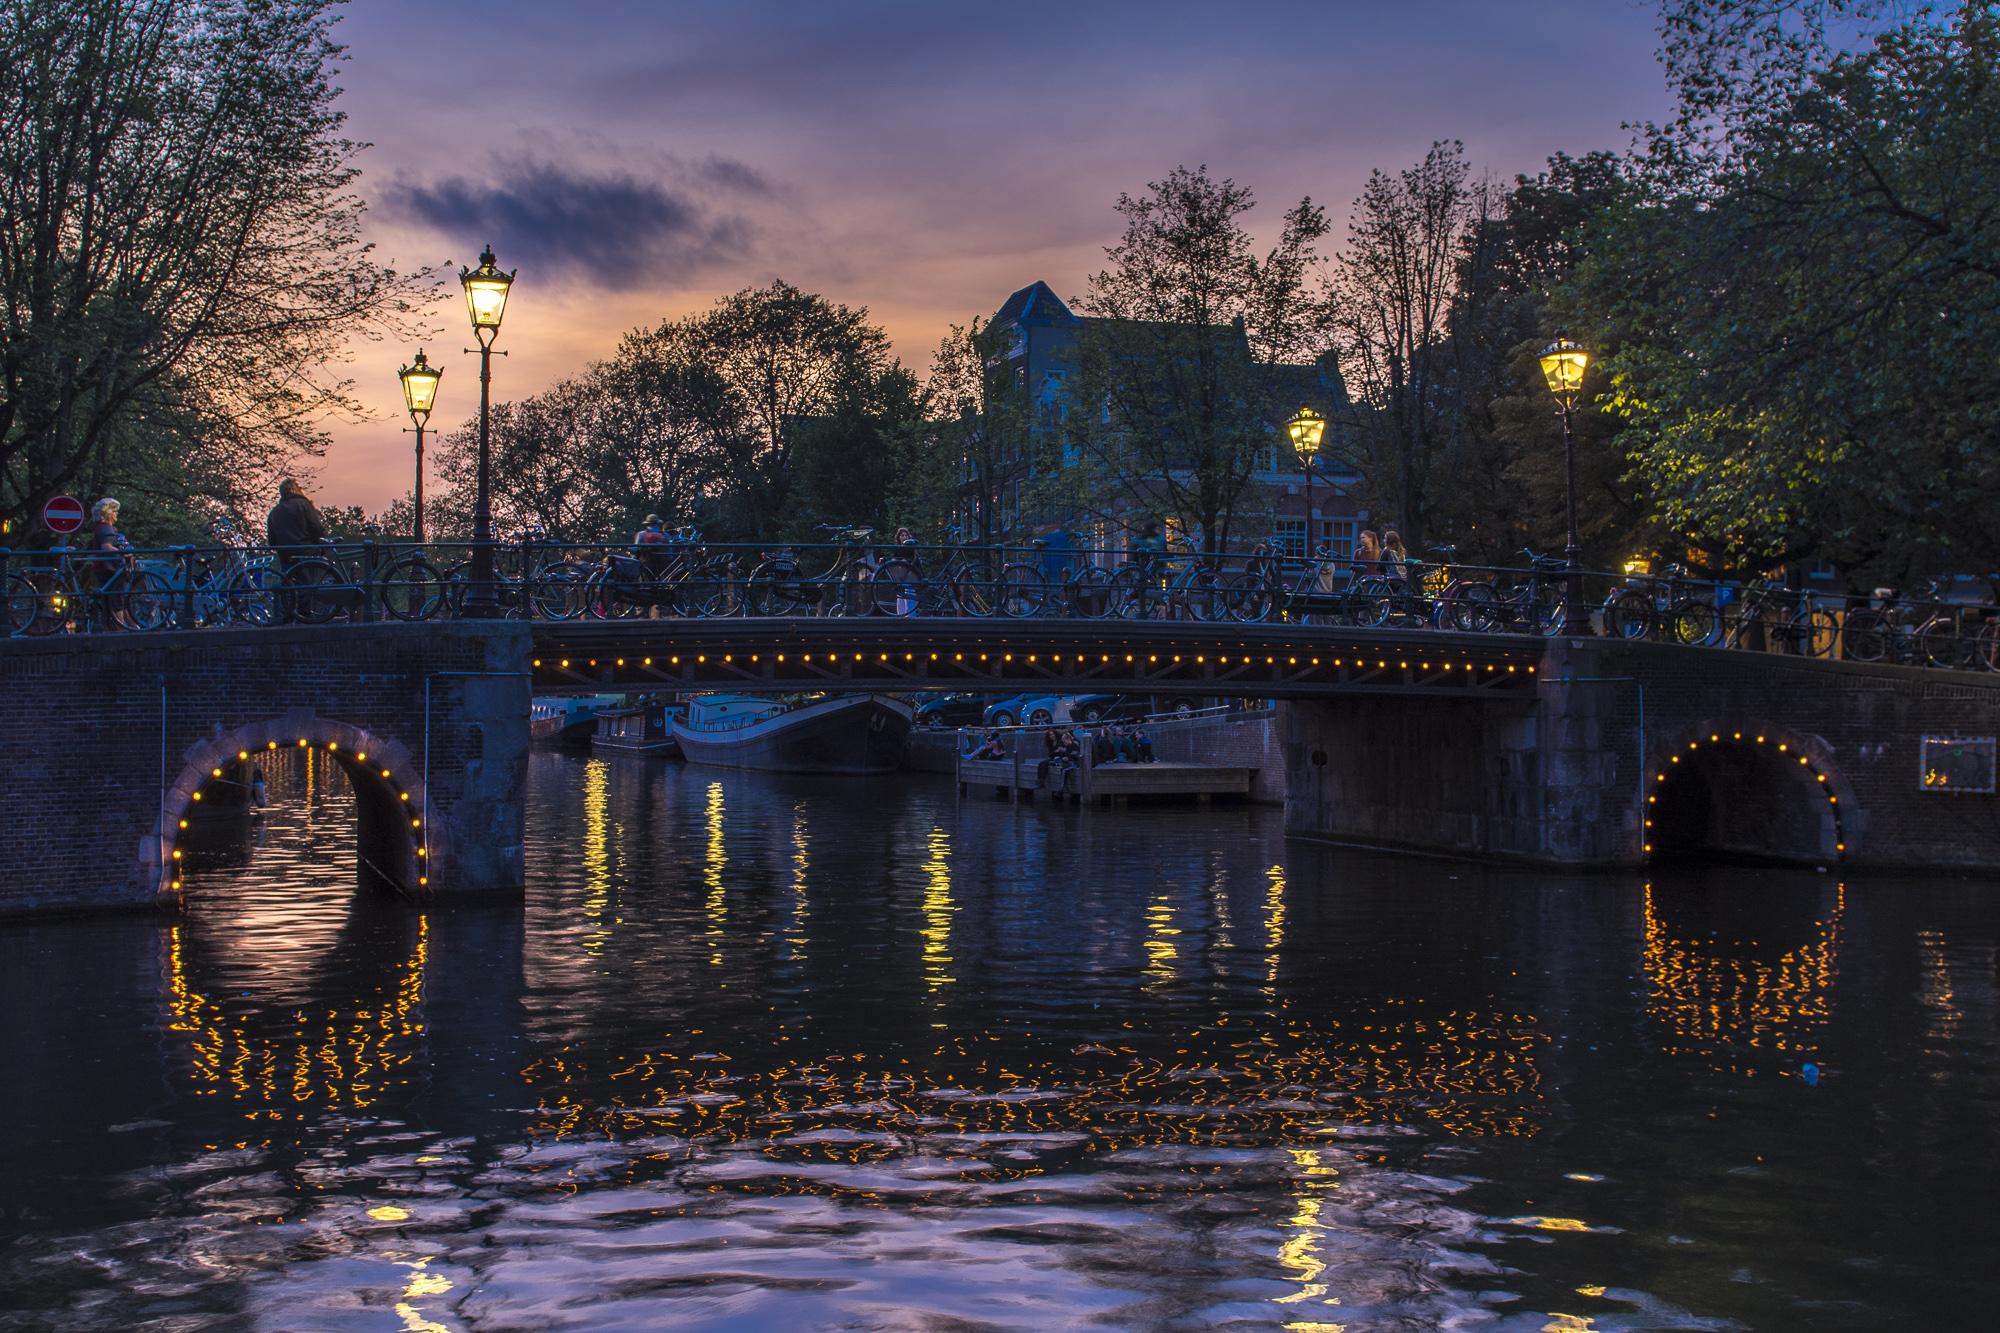 amsterdam-photo-tour-008.jpg